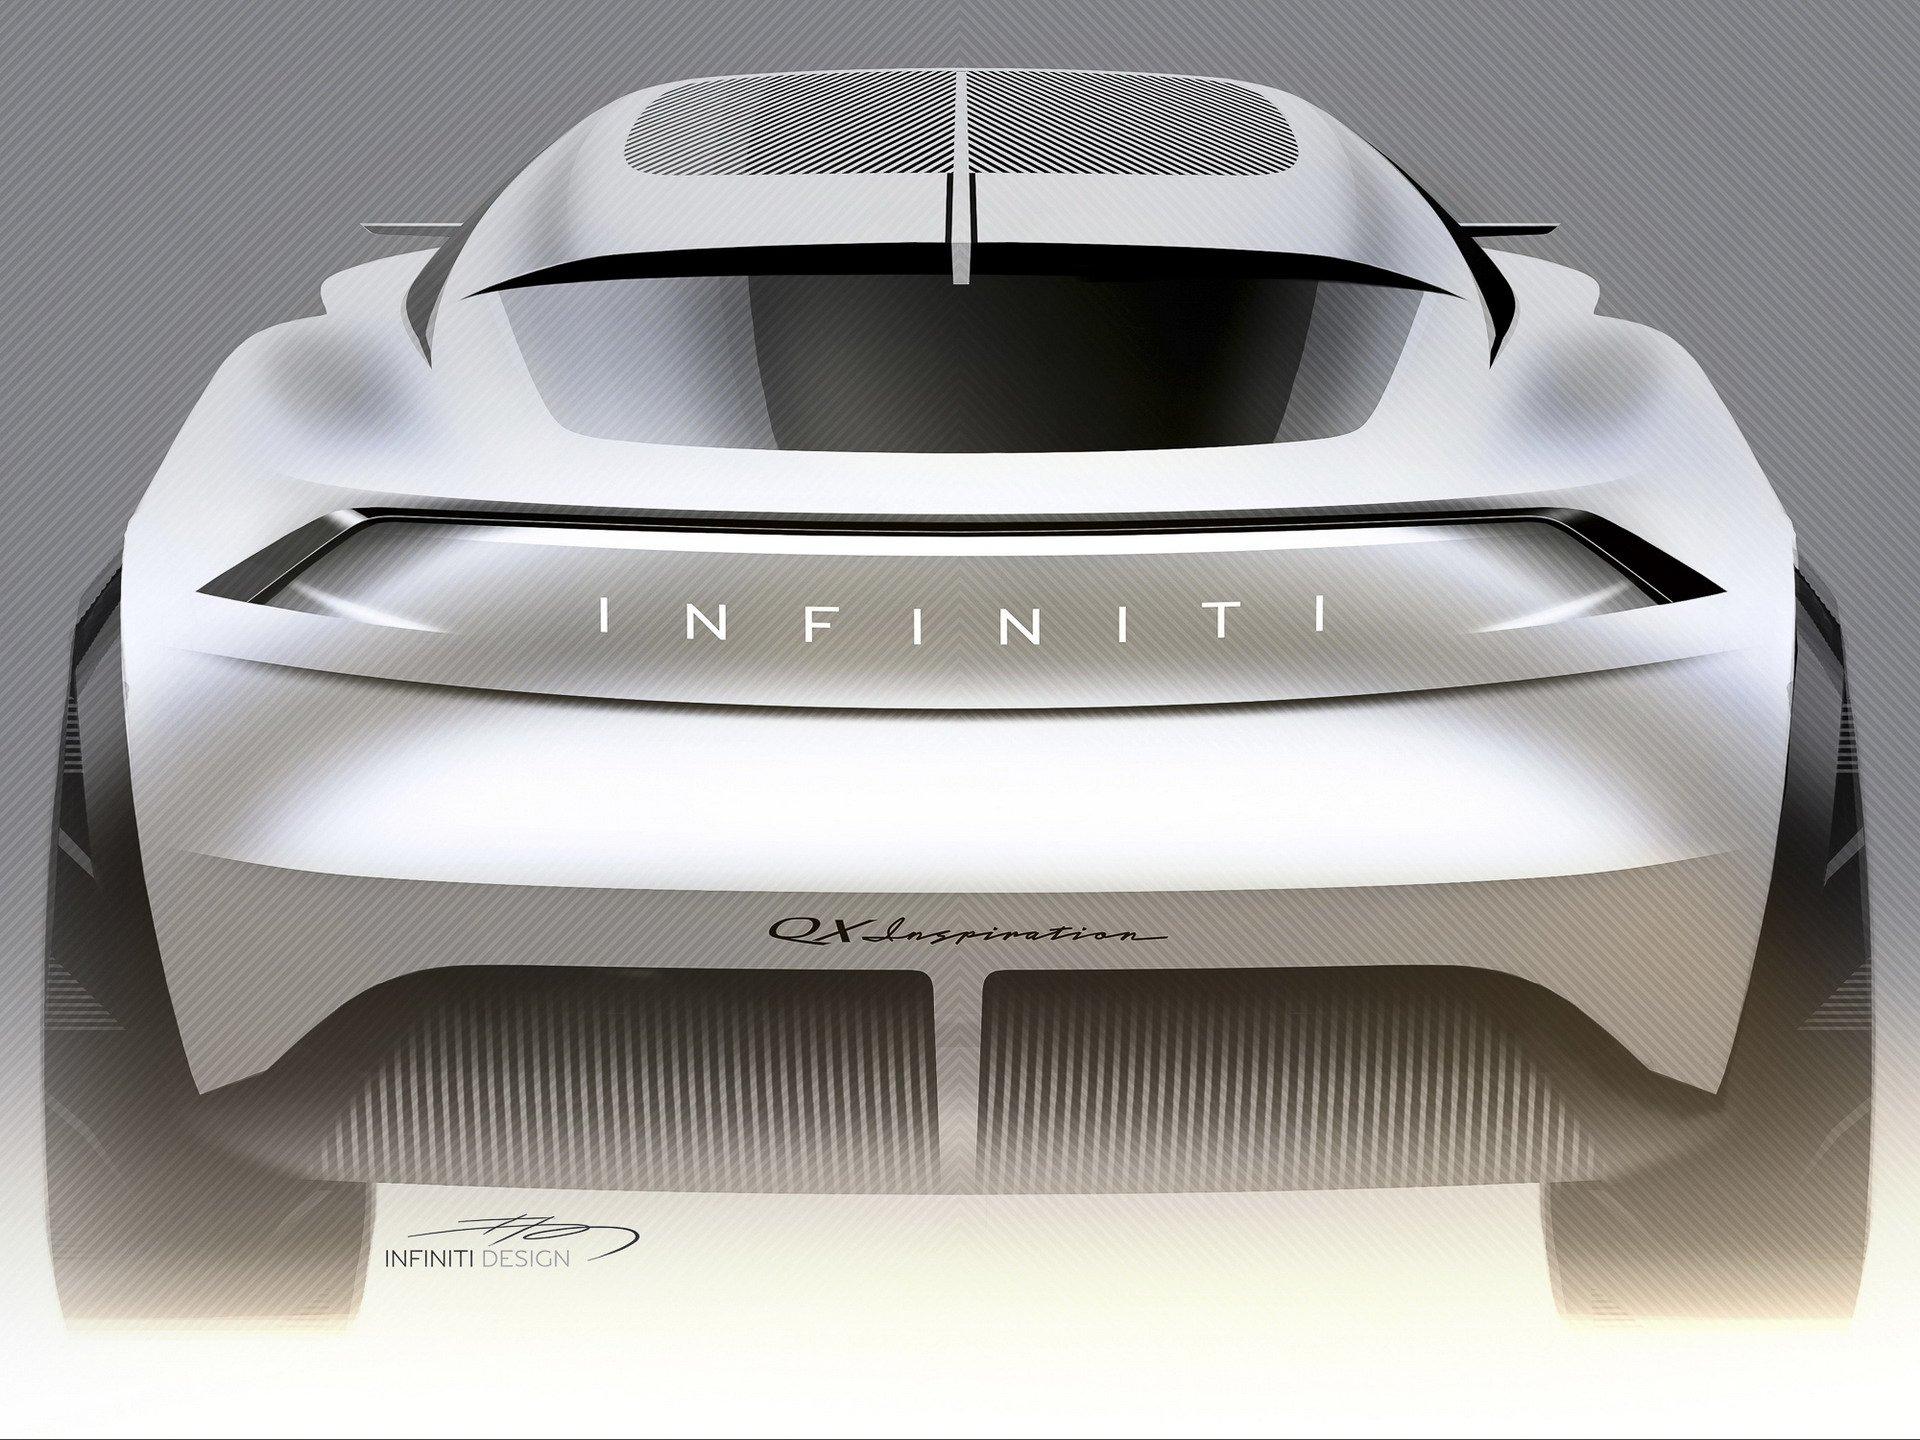 Infiniti QX Inspiration Concept (126)